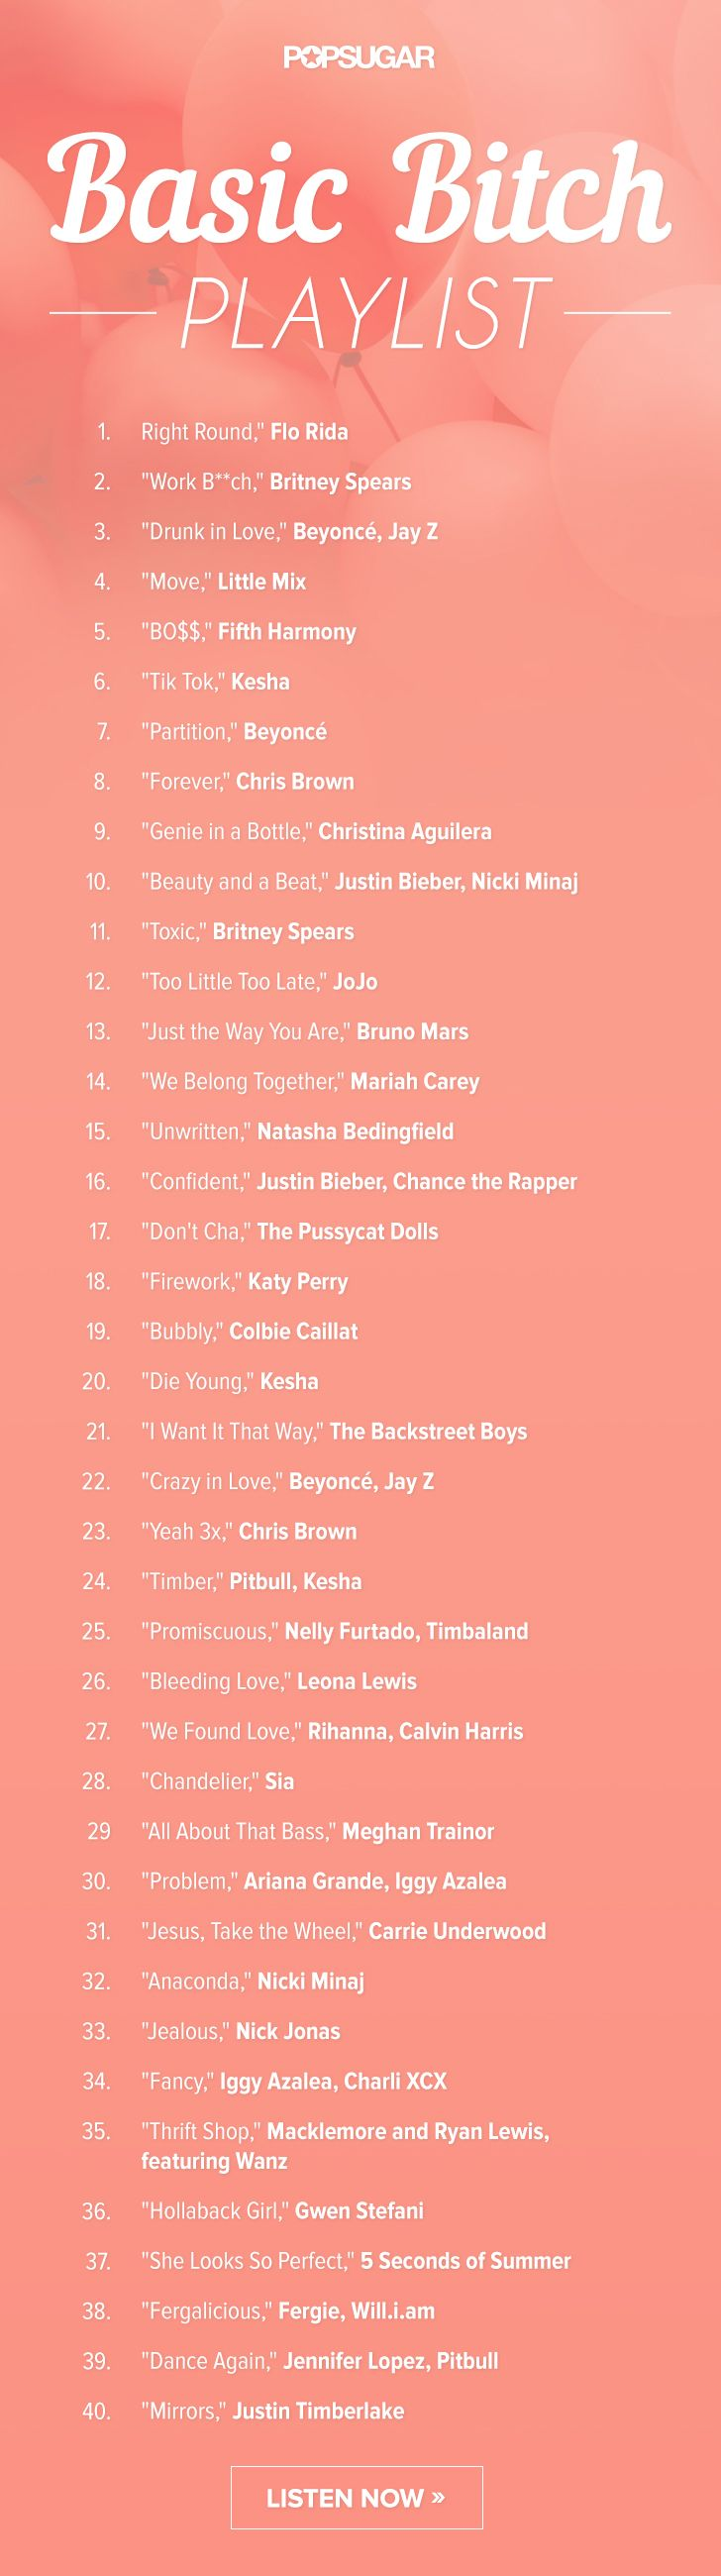 The ultimate basic b*tch playlist. Design your playlist instantly on Muzikool.com